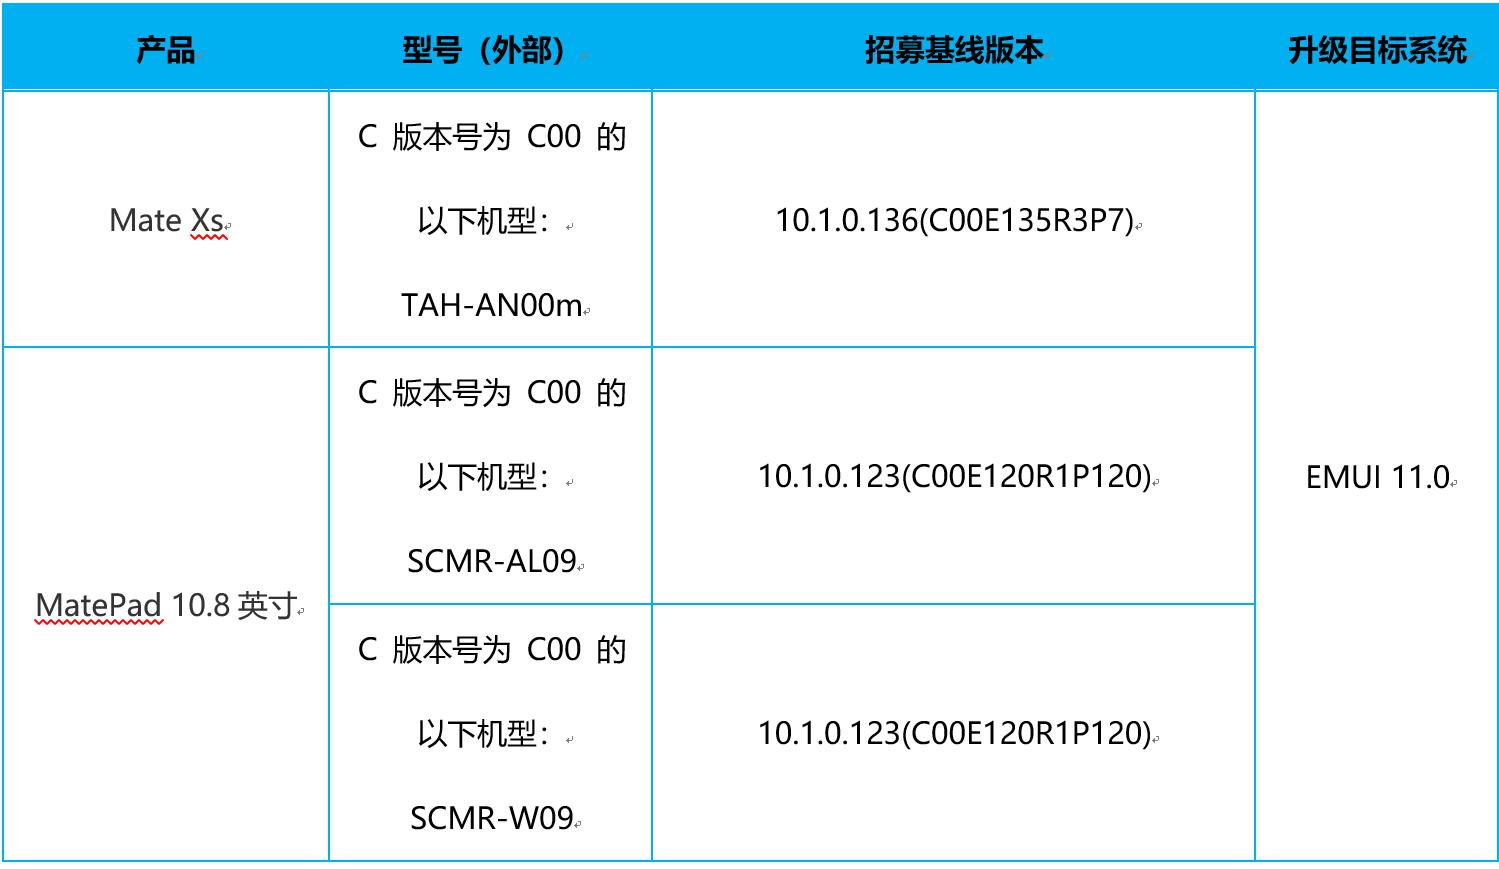 [Recruitment Announcement] Mate Xs /MatePad 10.8 inches open EMUI 11.0 version beta recruitment!